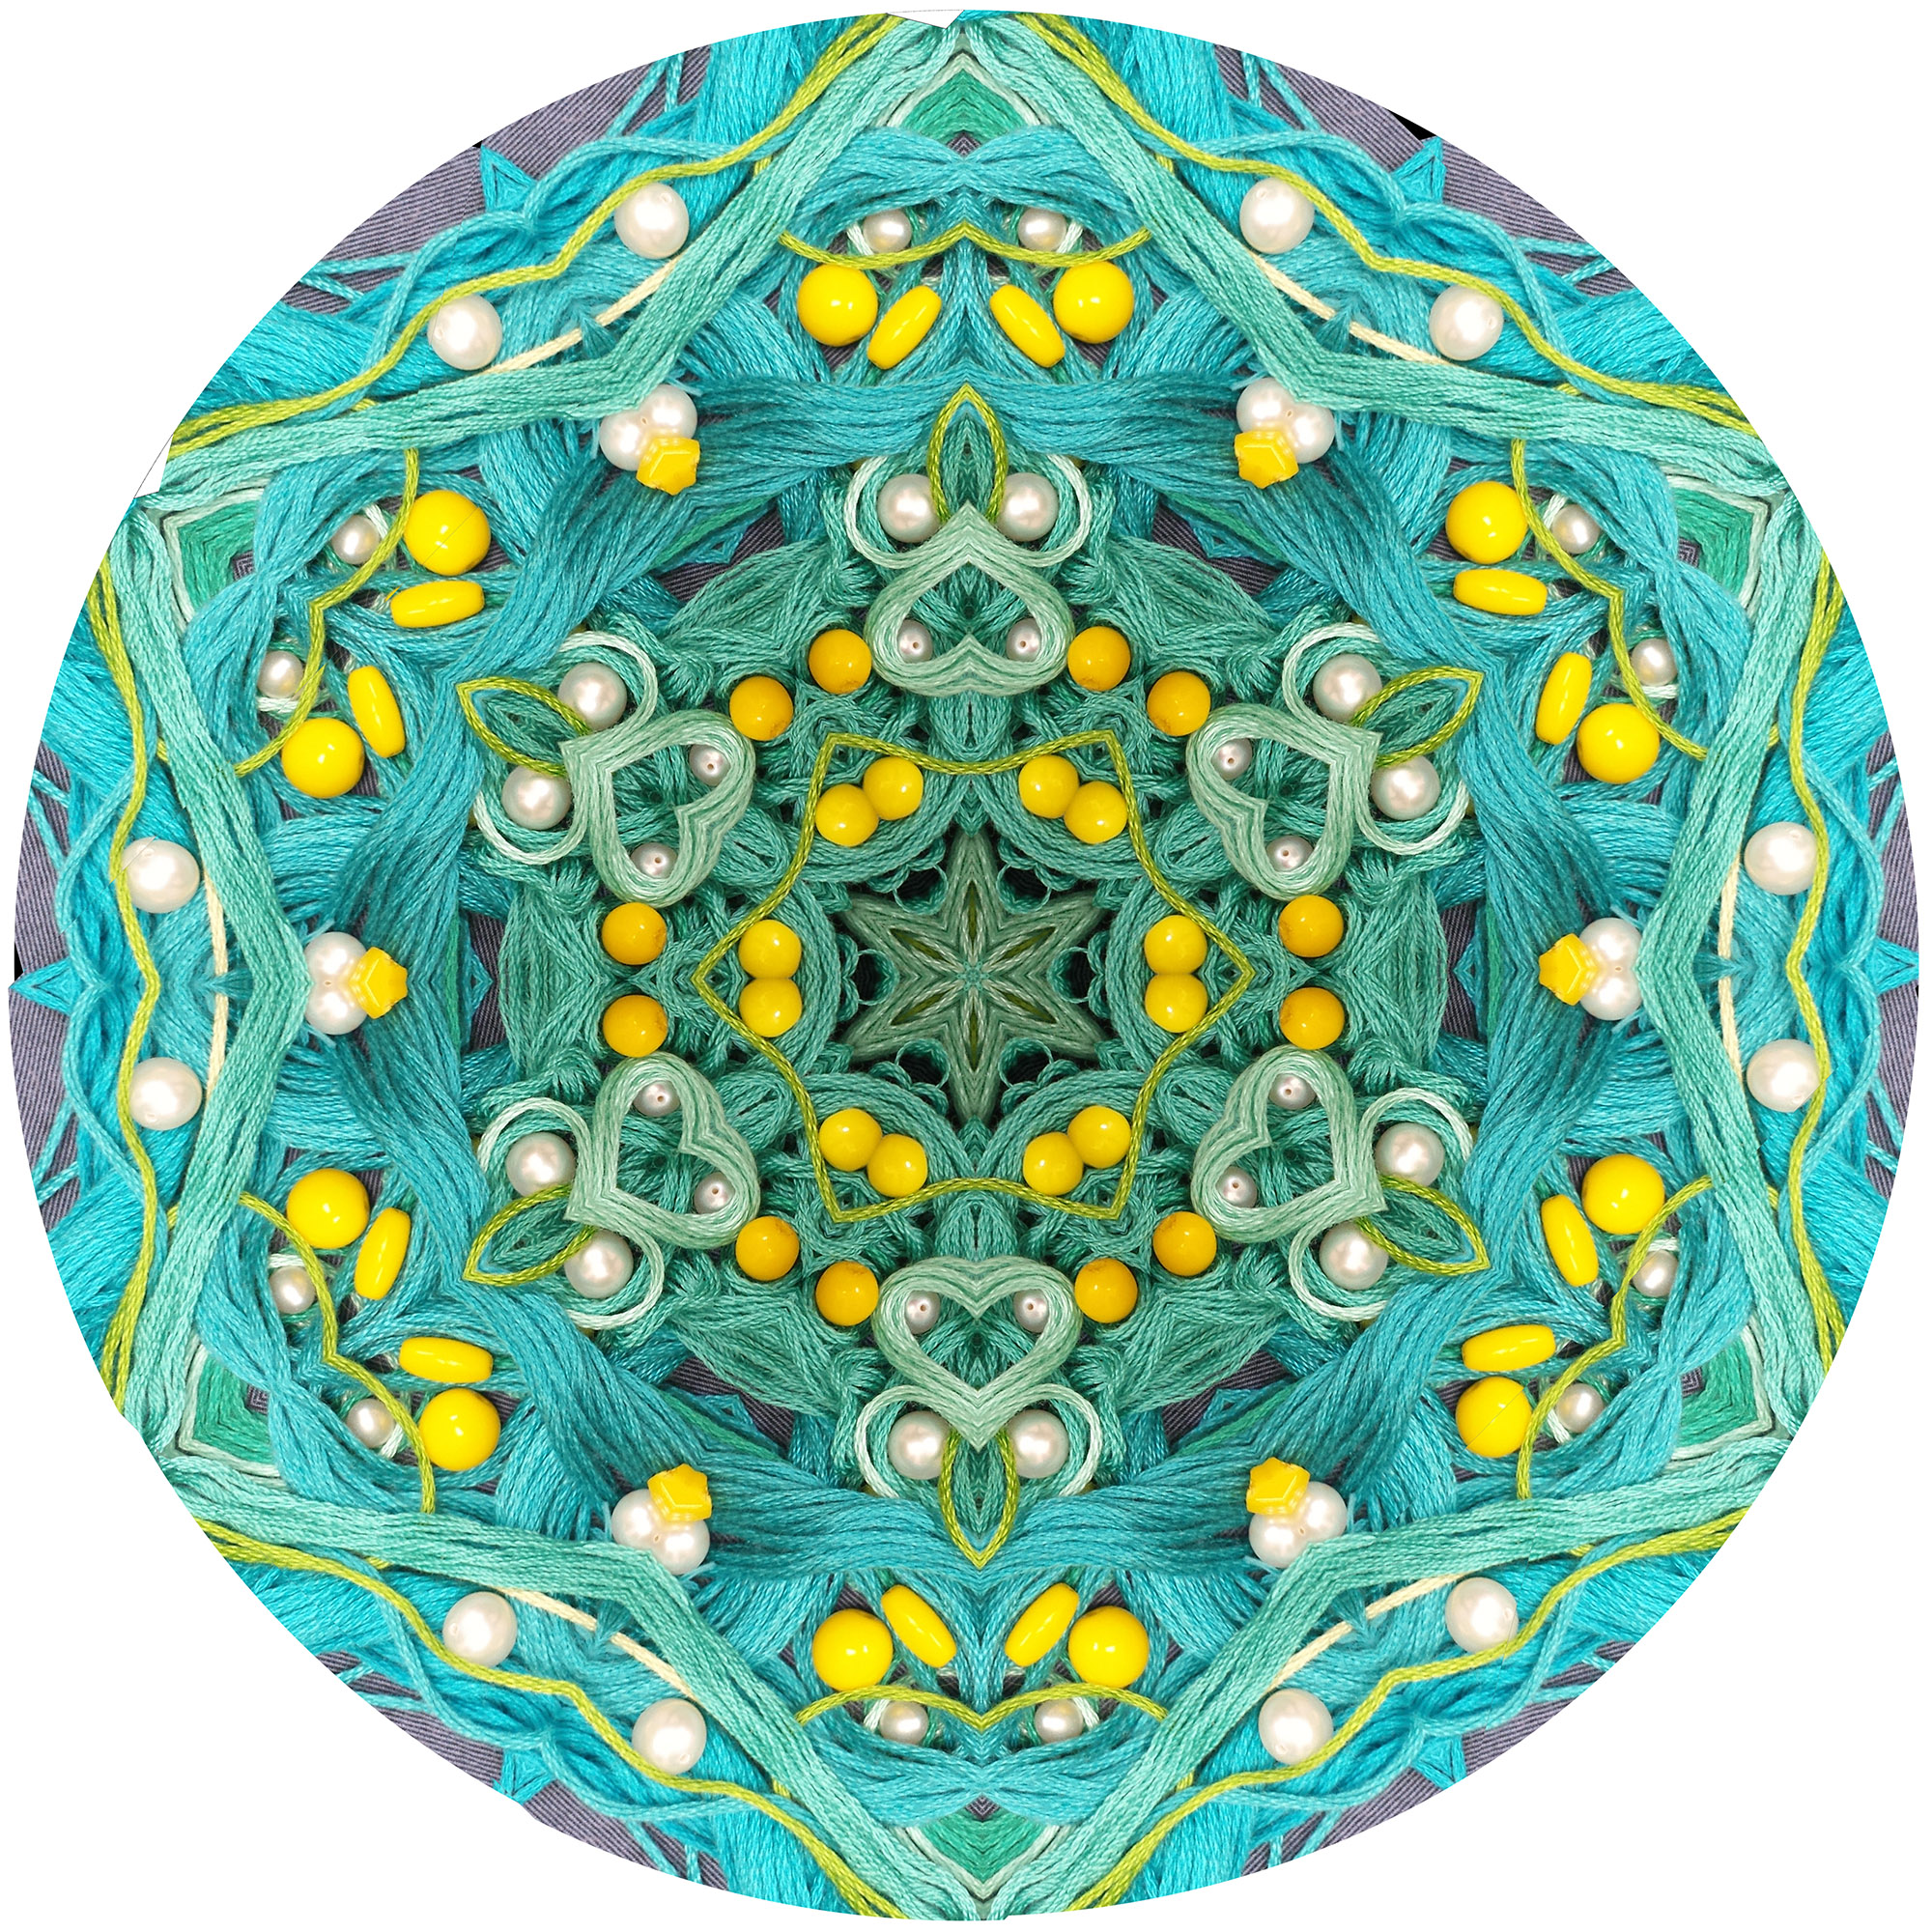 Thread, pearls, and yellow beads mandala